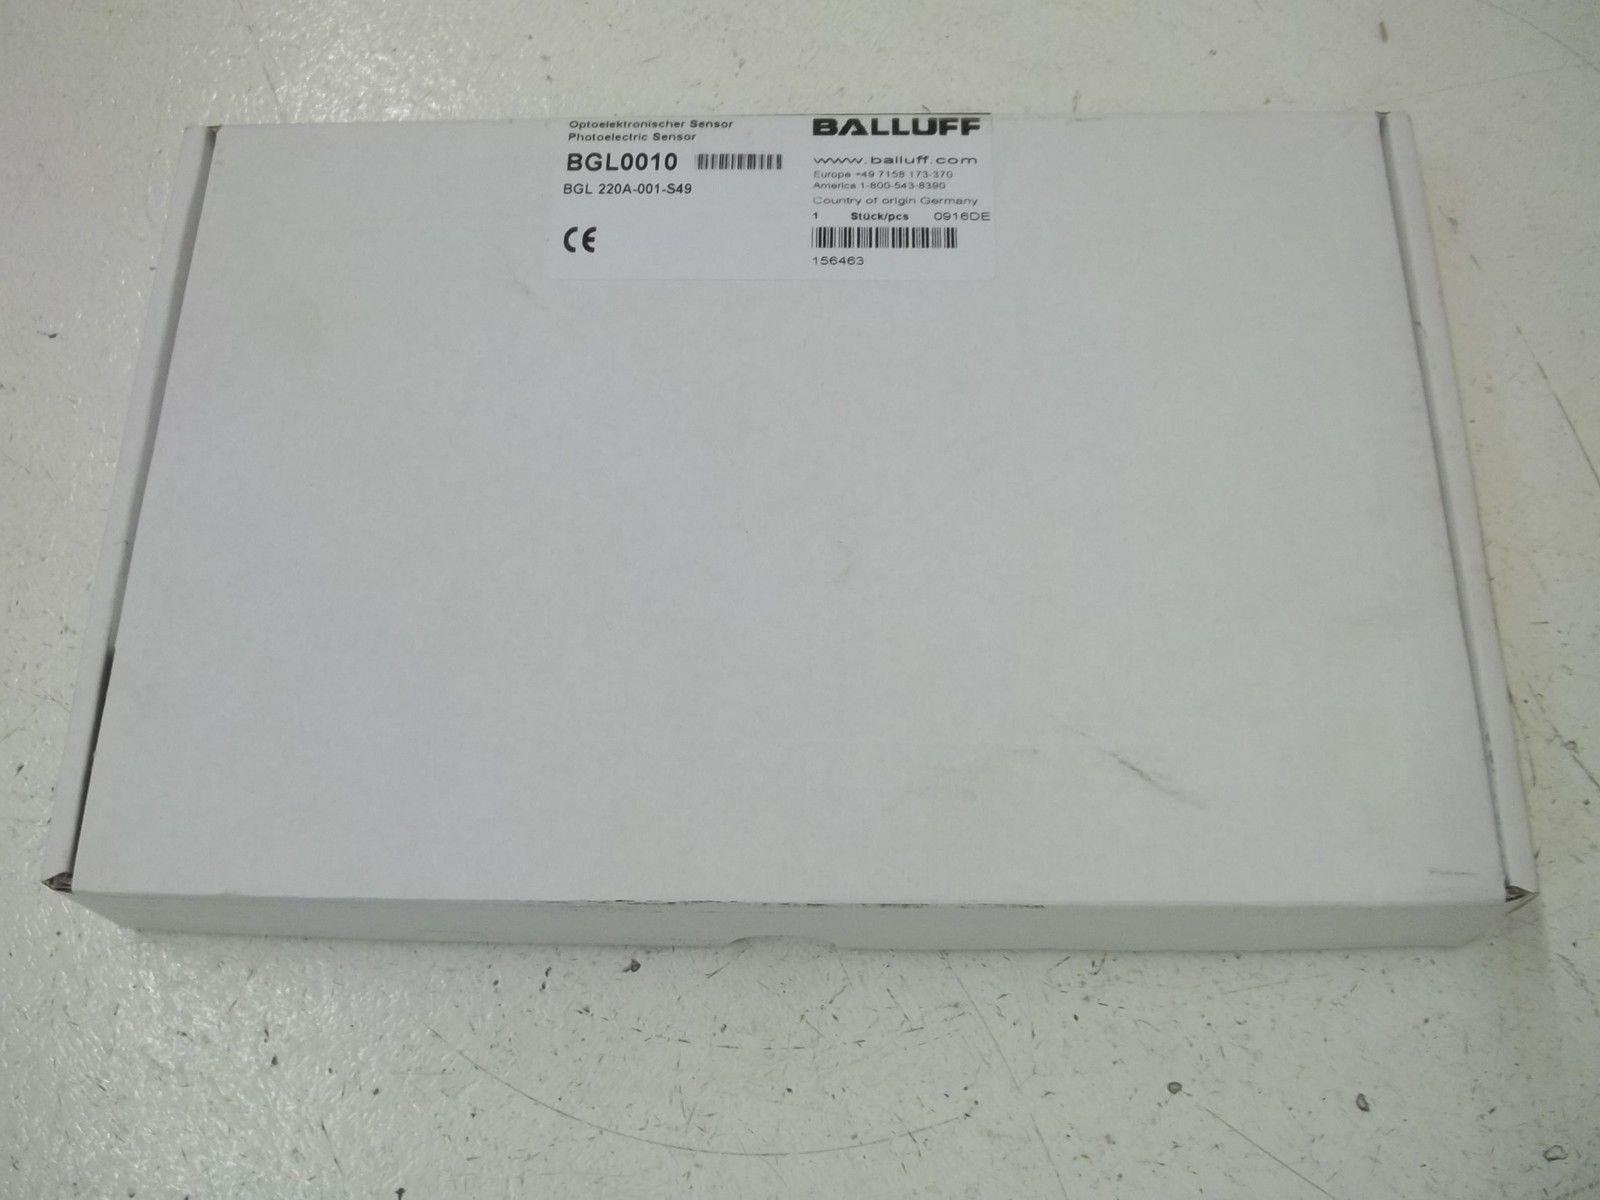 BALLUFF BGL220A-001-S49 PHOTOELECTRIC SENSOR NEW IN BOX